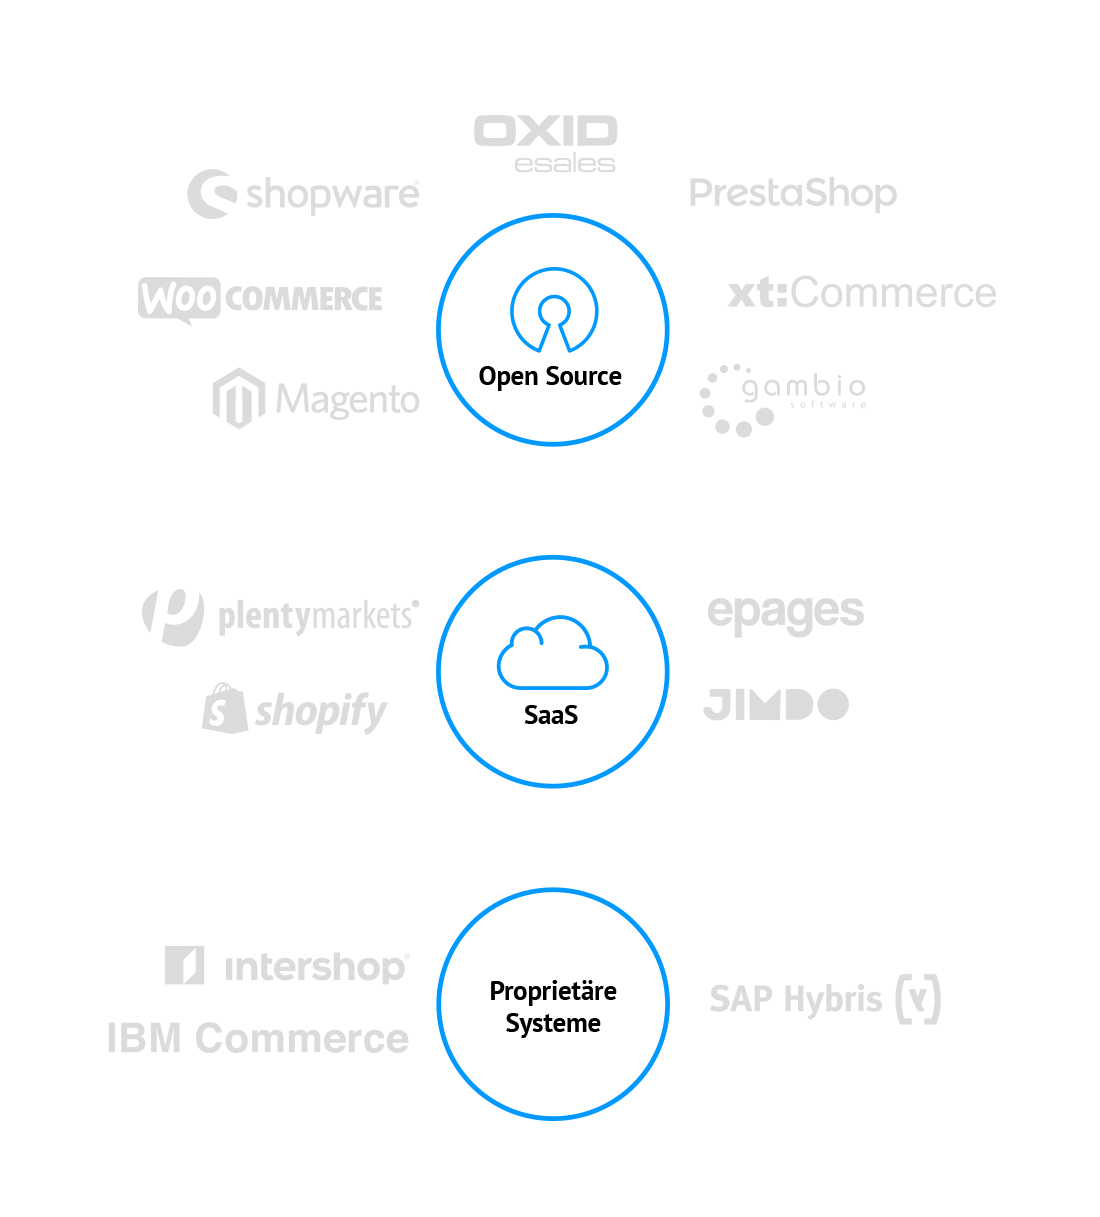 Open Source Saas Properietäre Systeme